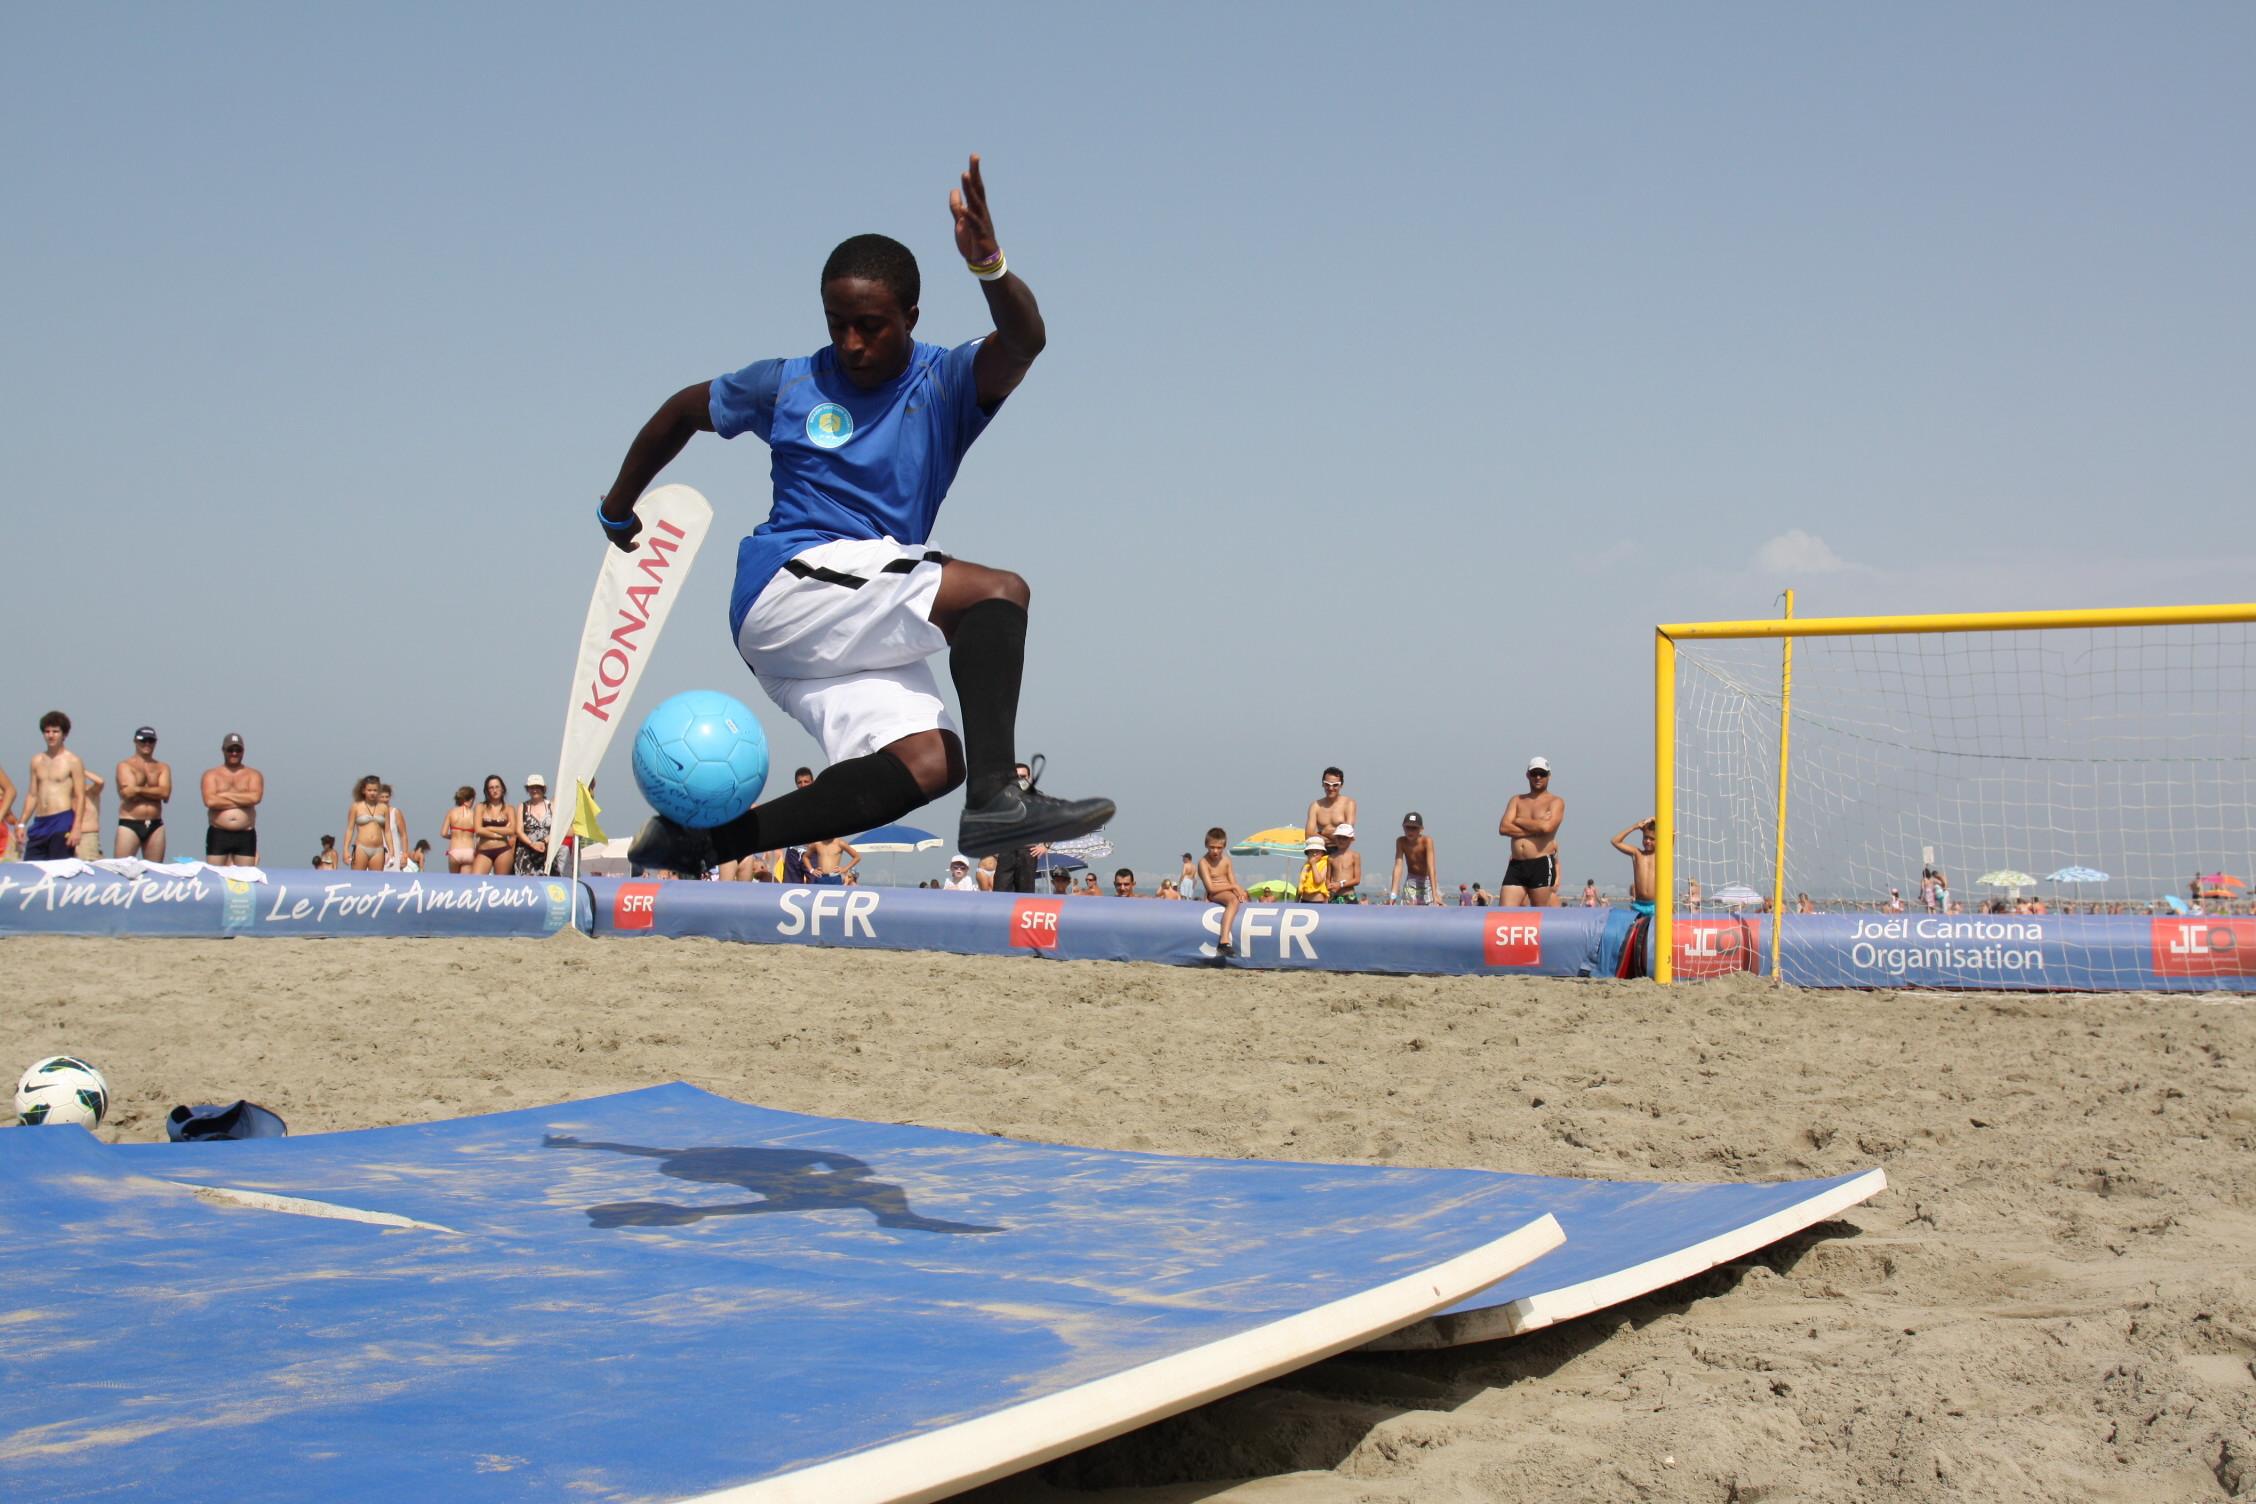 www.freestyleworldfootball.com.JPG